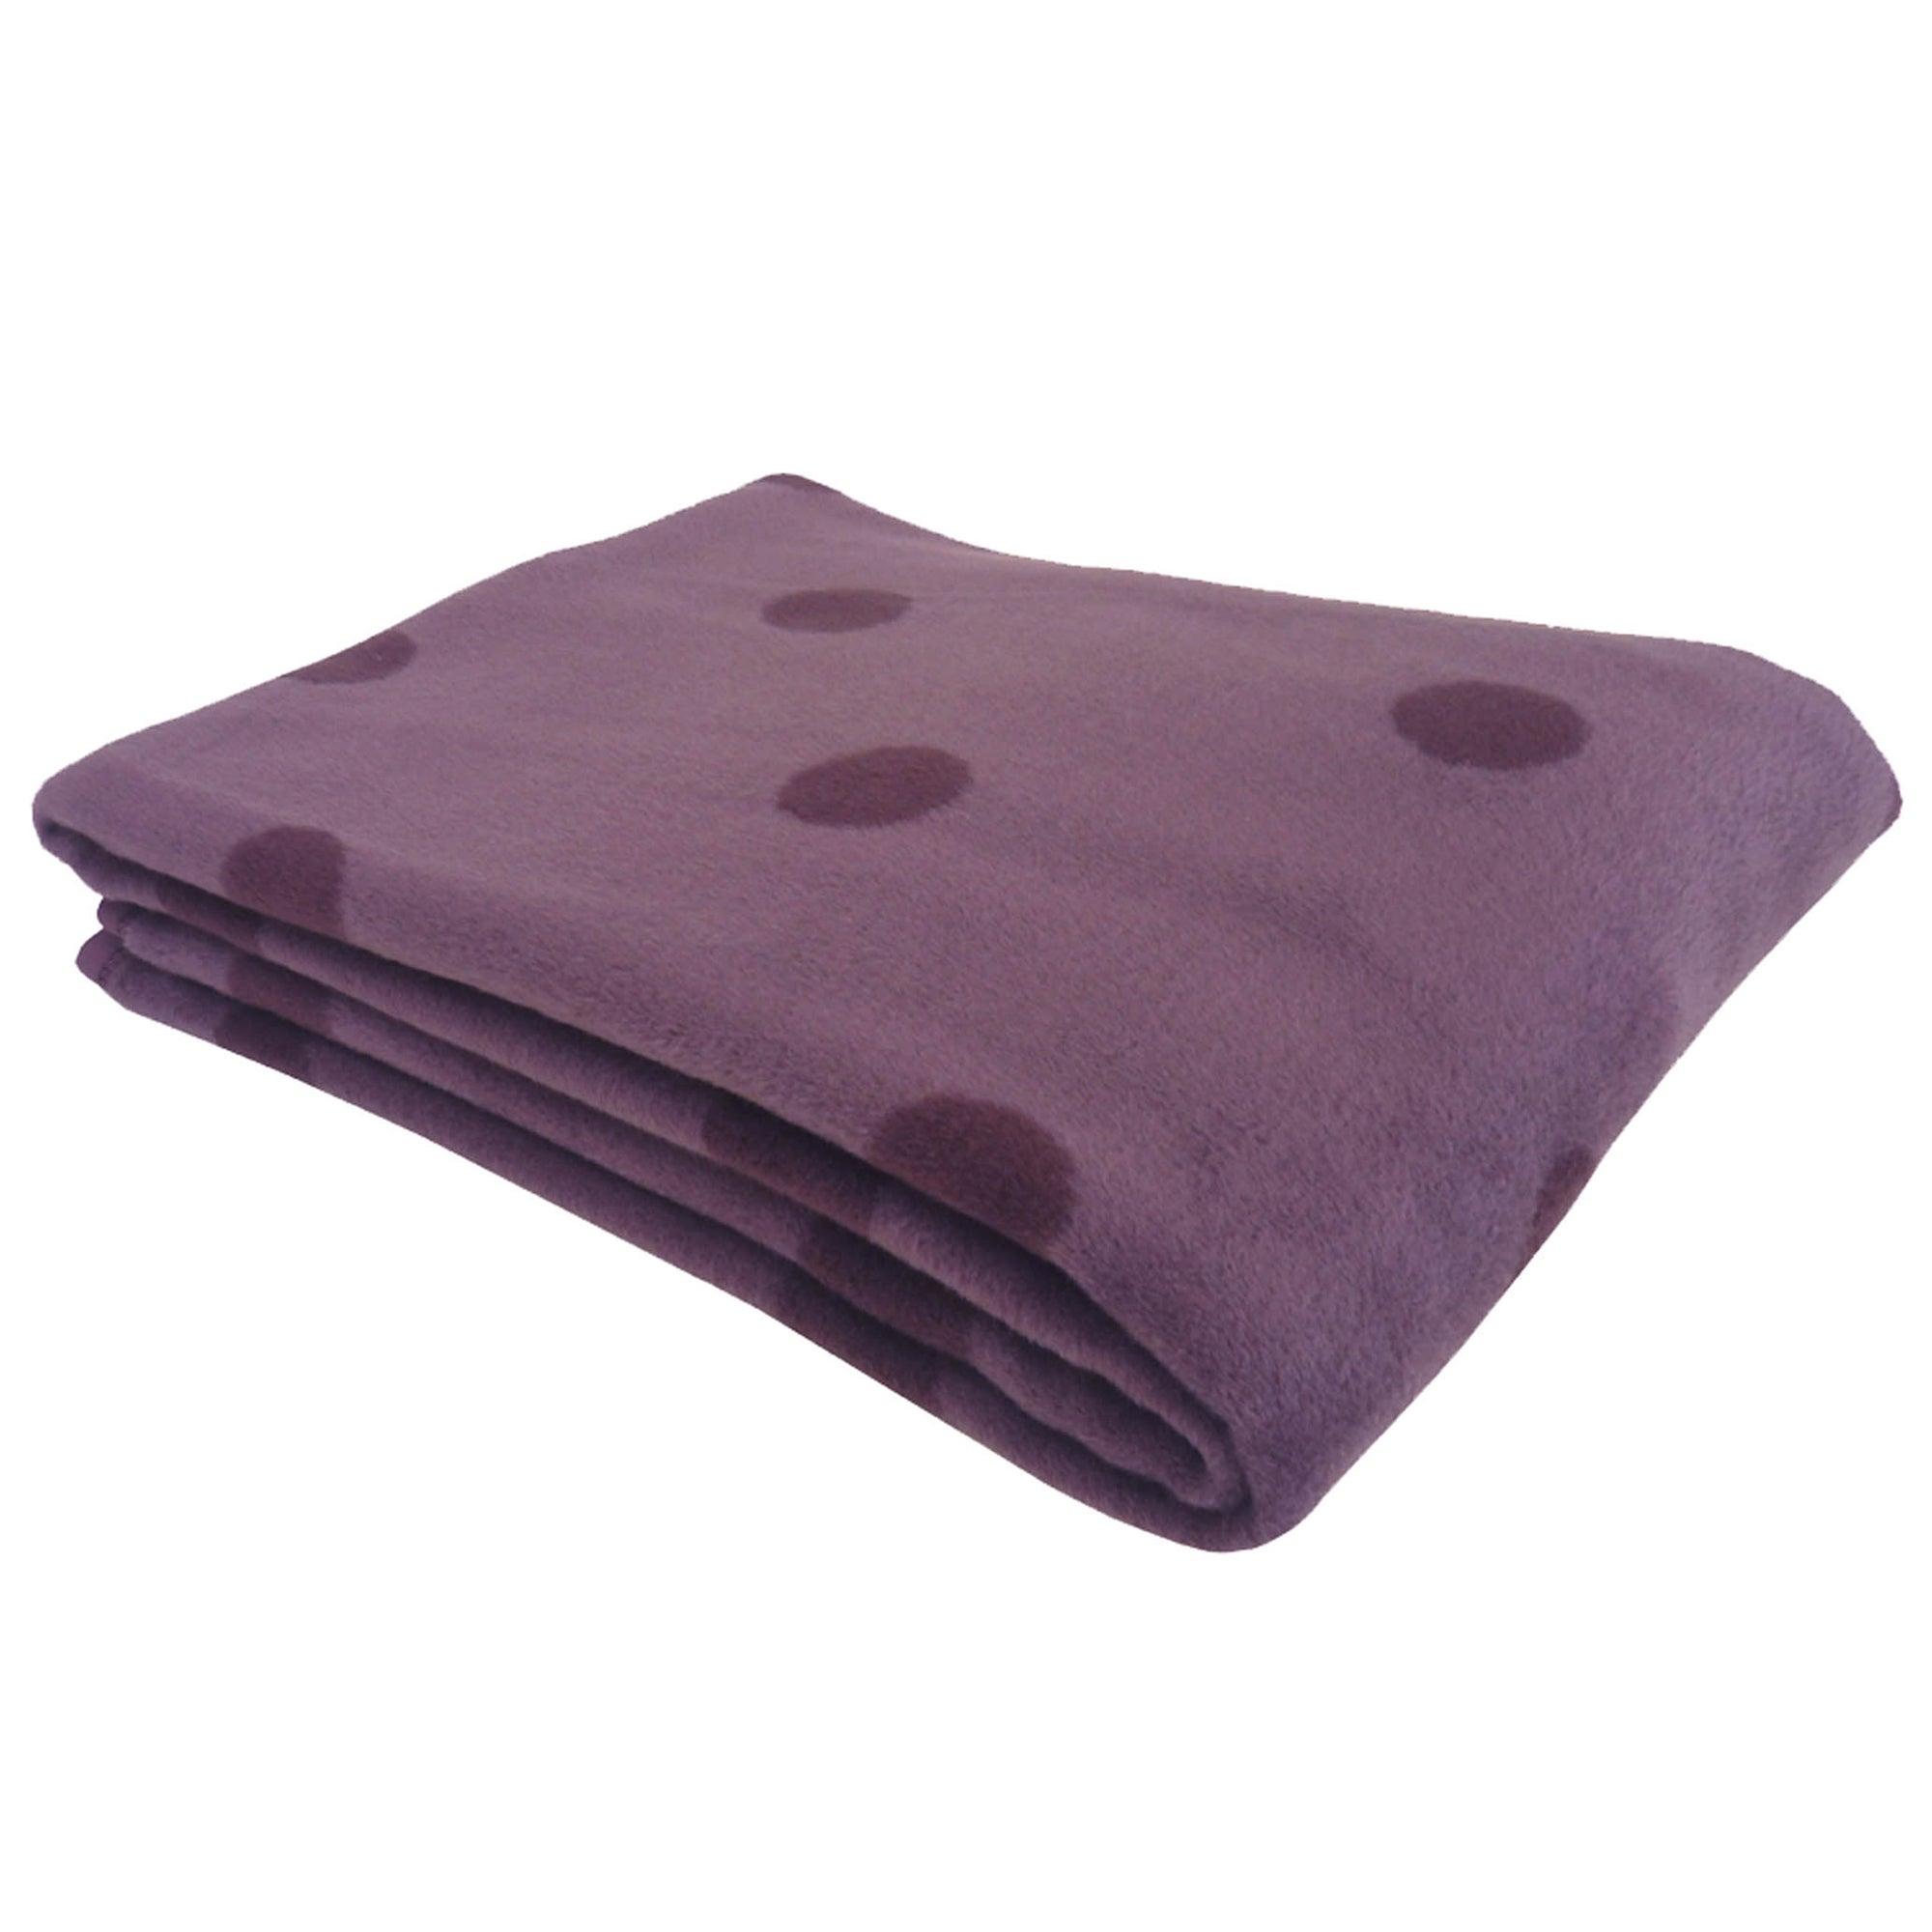 Thermosoft Aubergine Spots Blanket